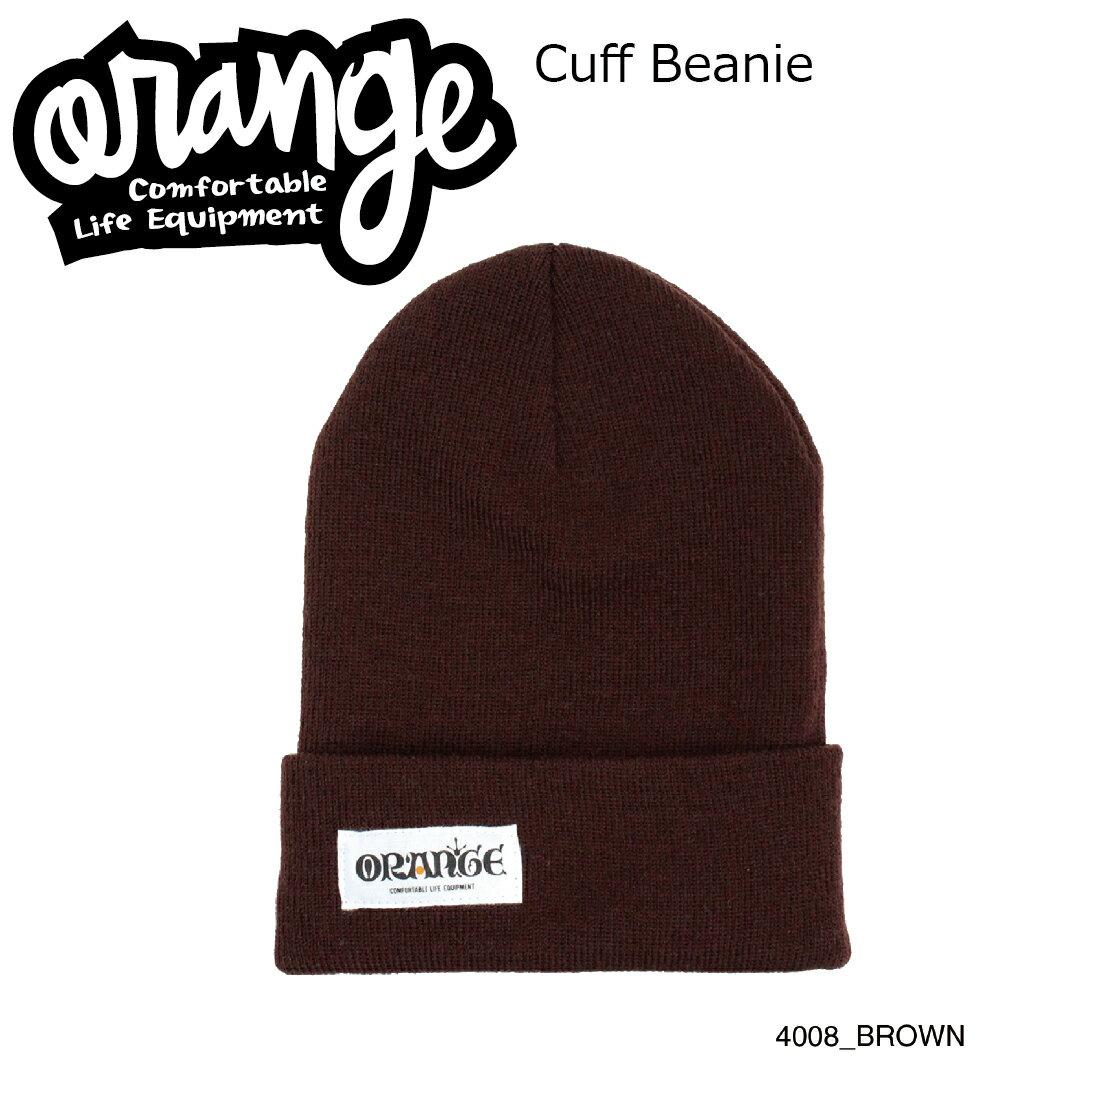 Oran'ge Cuff Beanie 4008 BROWN オレンジ カフ ビーニー ニットキャップ 2つ折り